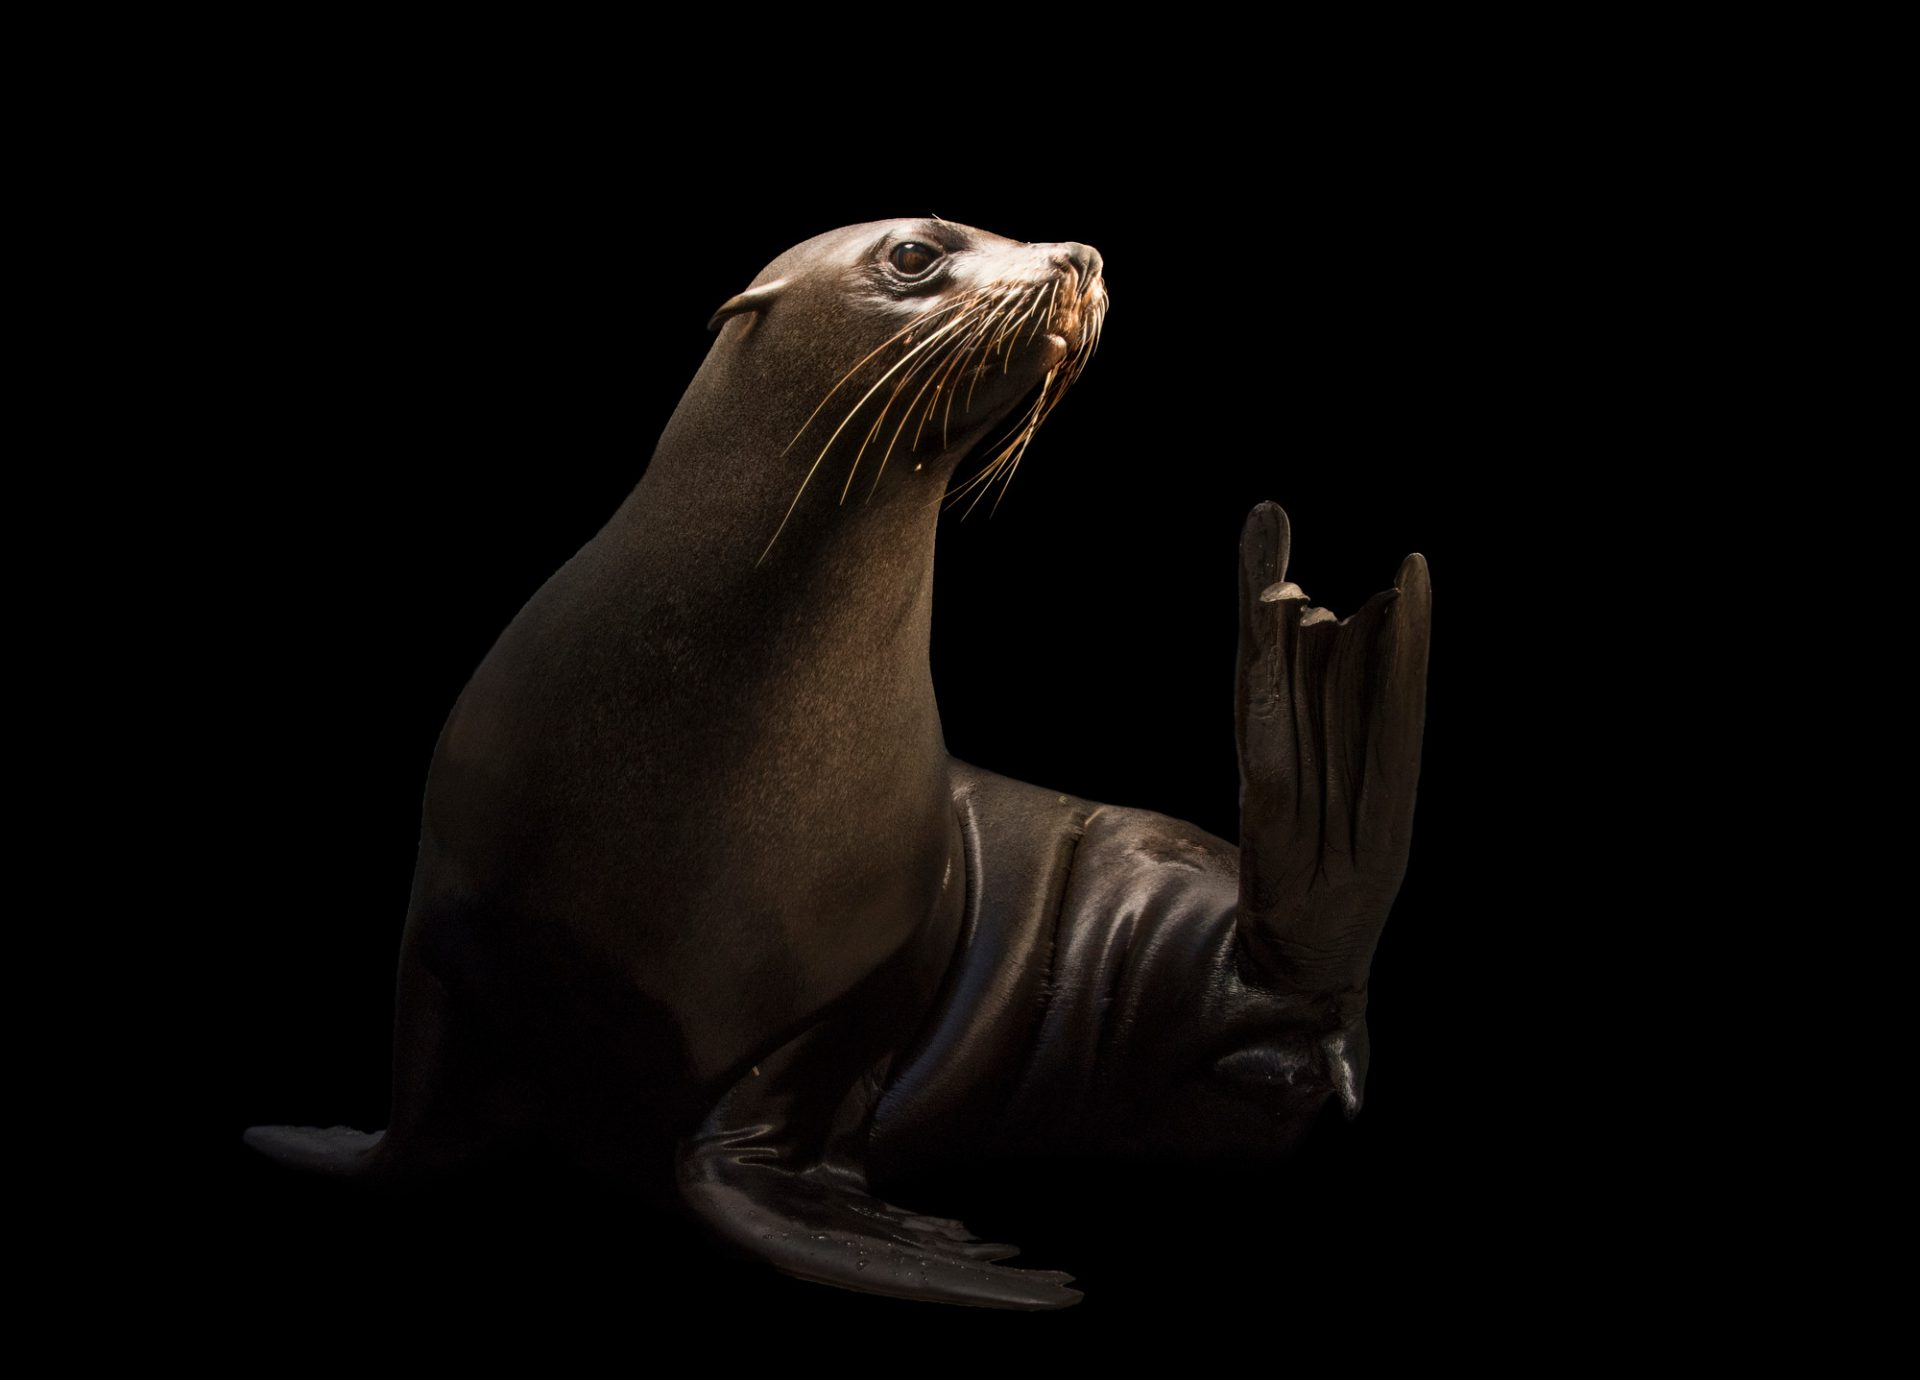 Photo: An Afro Australian fur seal (Arctocephalus pusillus) at the Faunia zoo in Madrid, Spain.